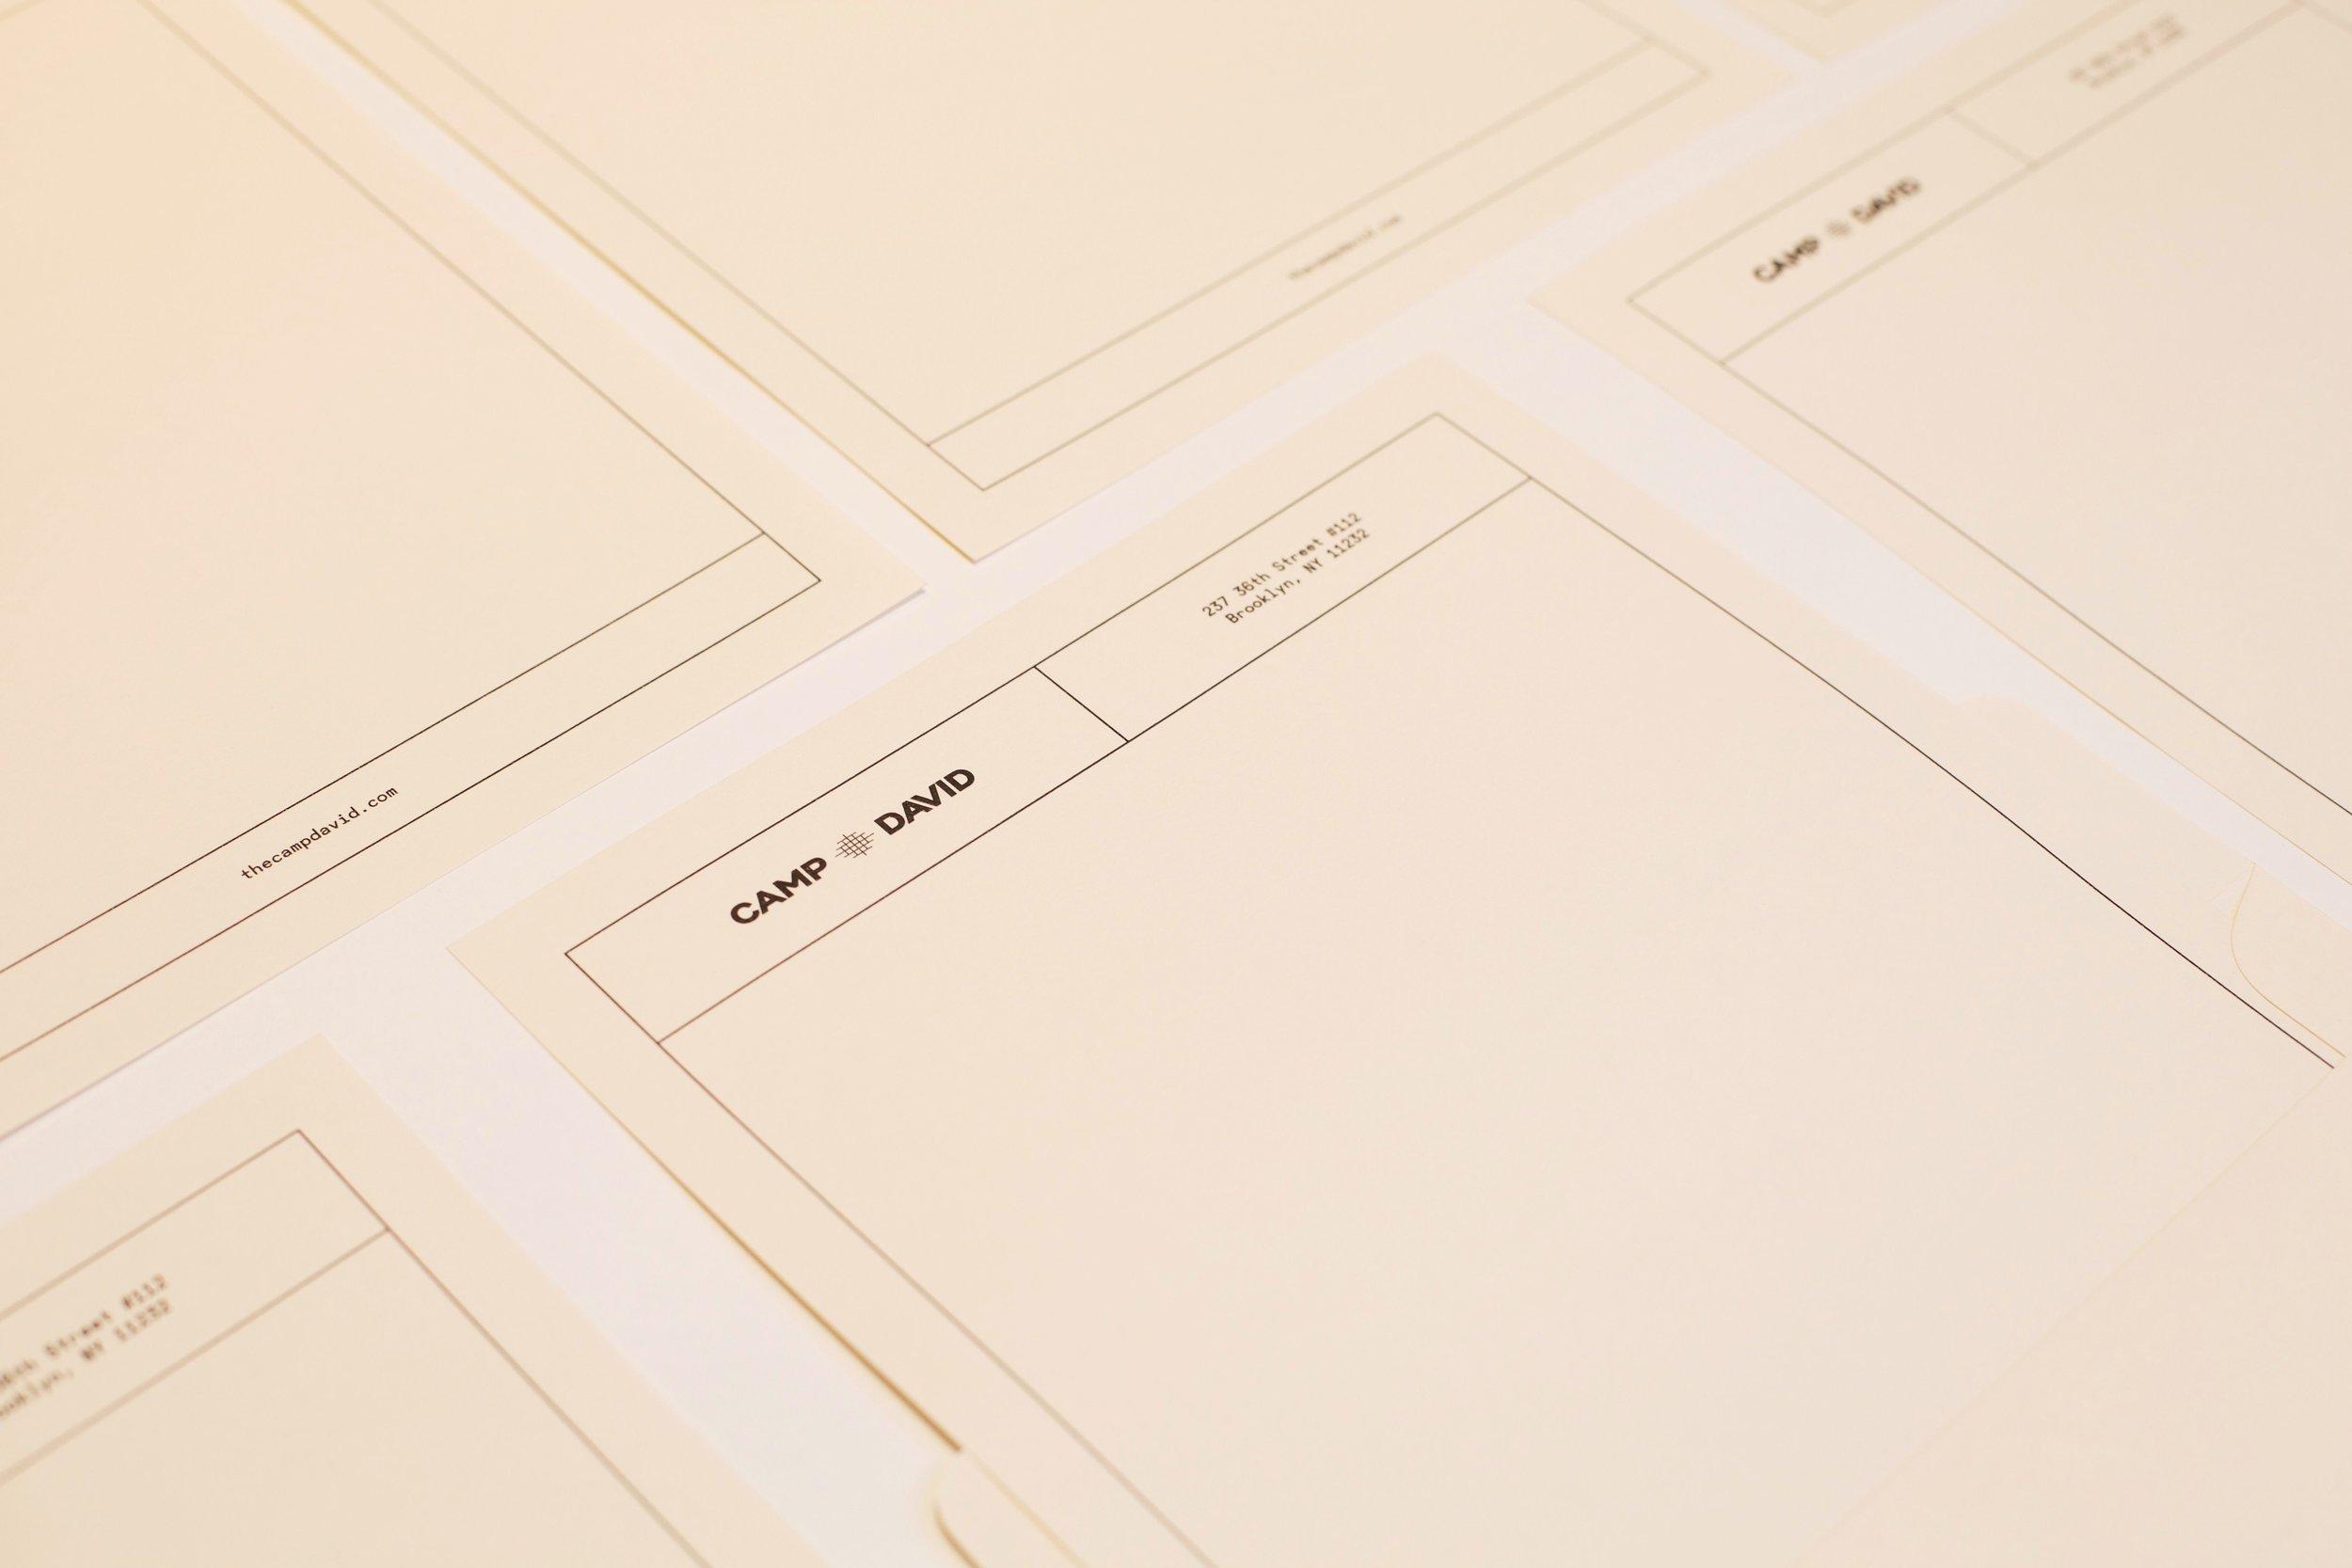 zmaic-milk-camp-david-collateral-print-design-letterheads.jpg